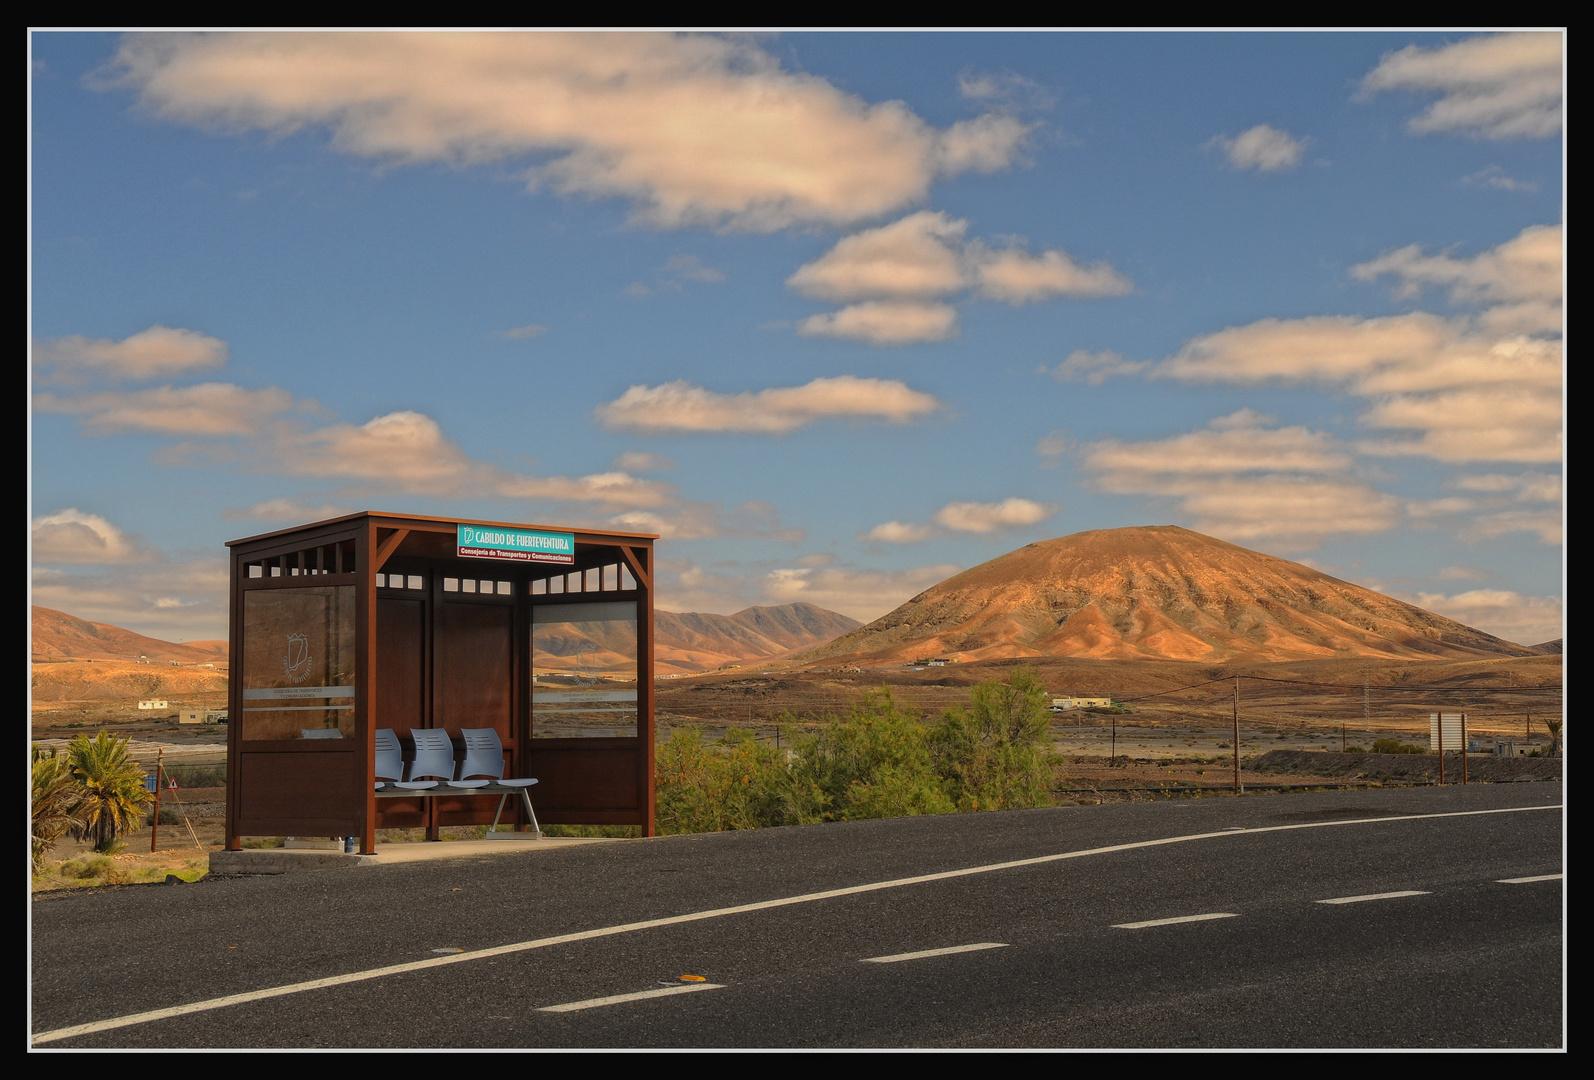 Fuerteventura - On the road